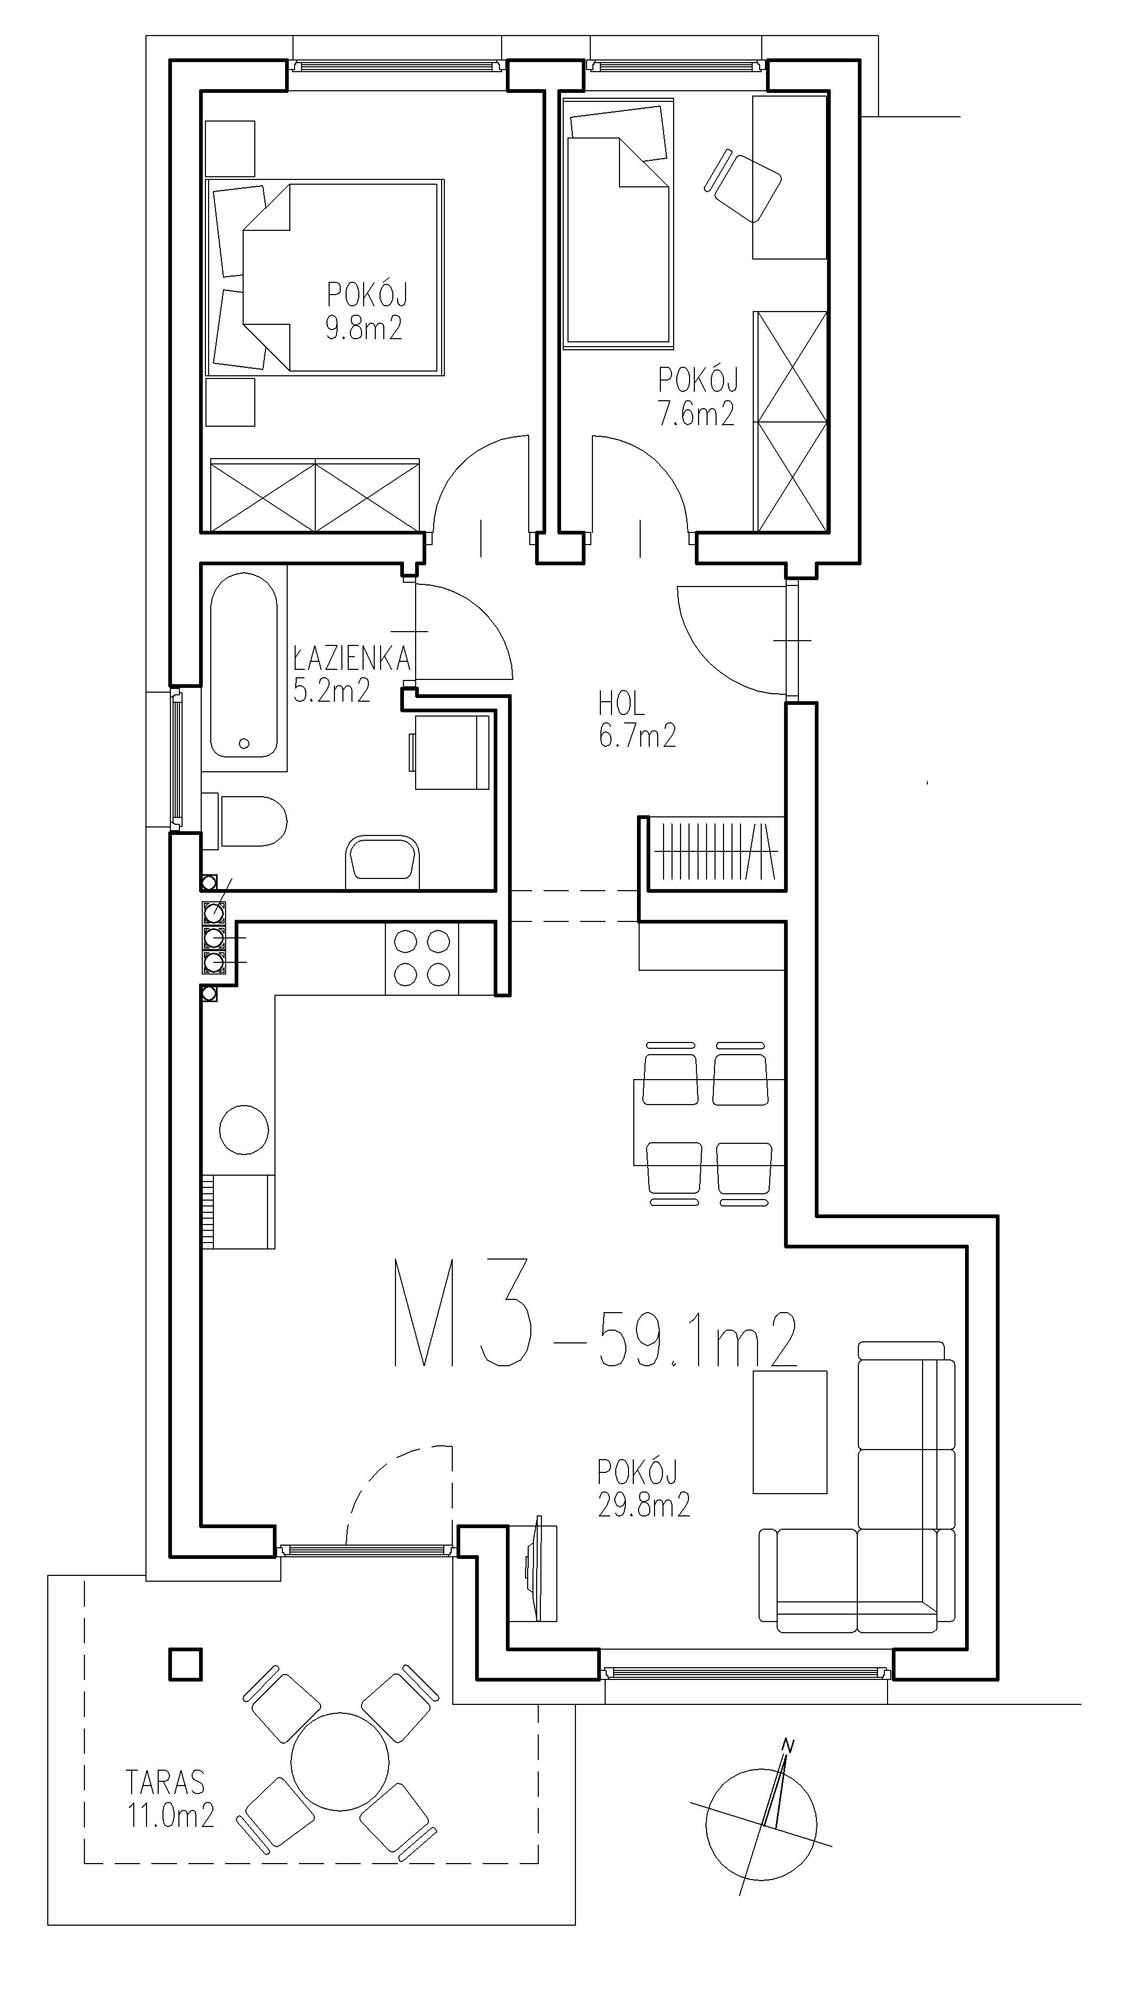 KTK Deweloper - Ełk - ul. Ogrodowa - Blok nr 2 - Mieszkanie nr 14